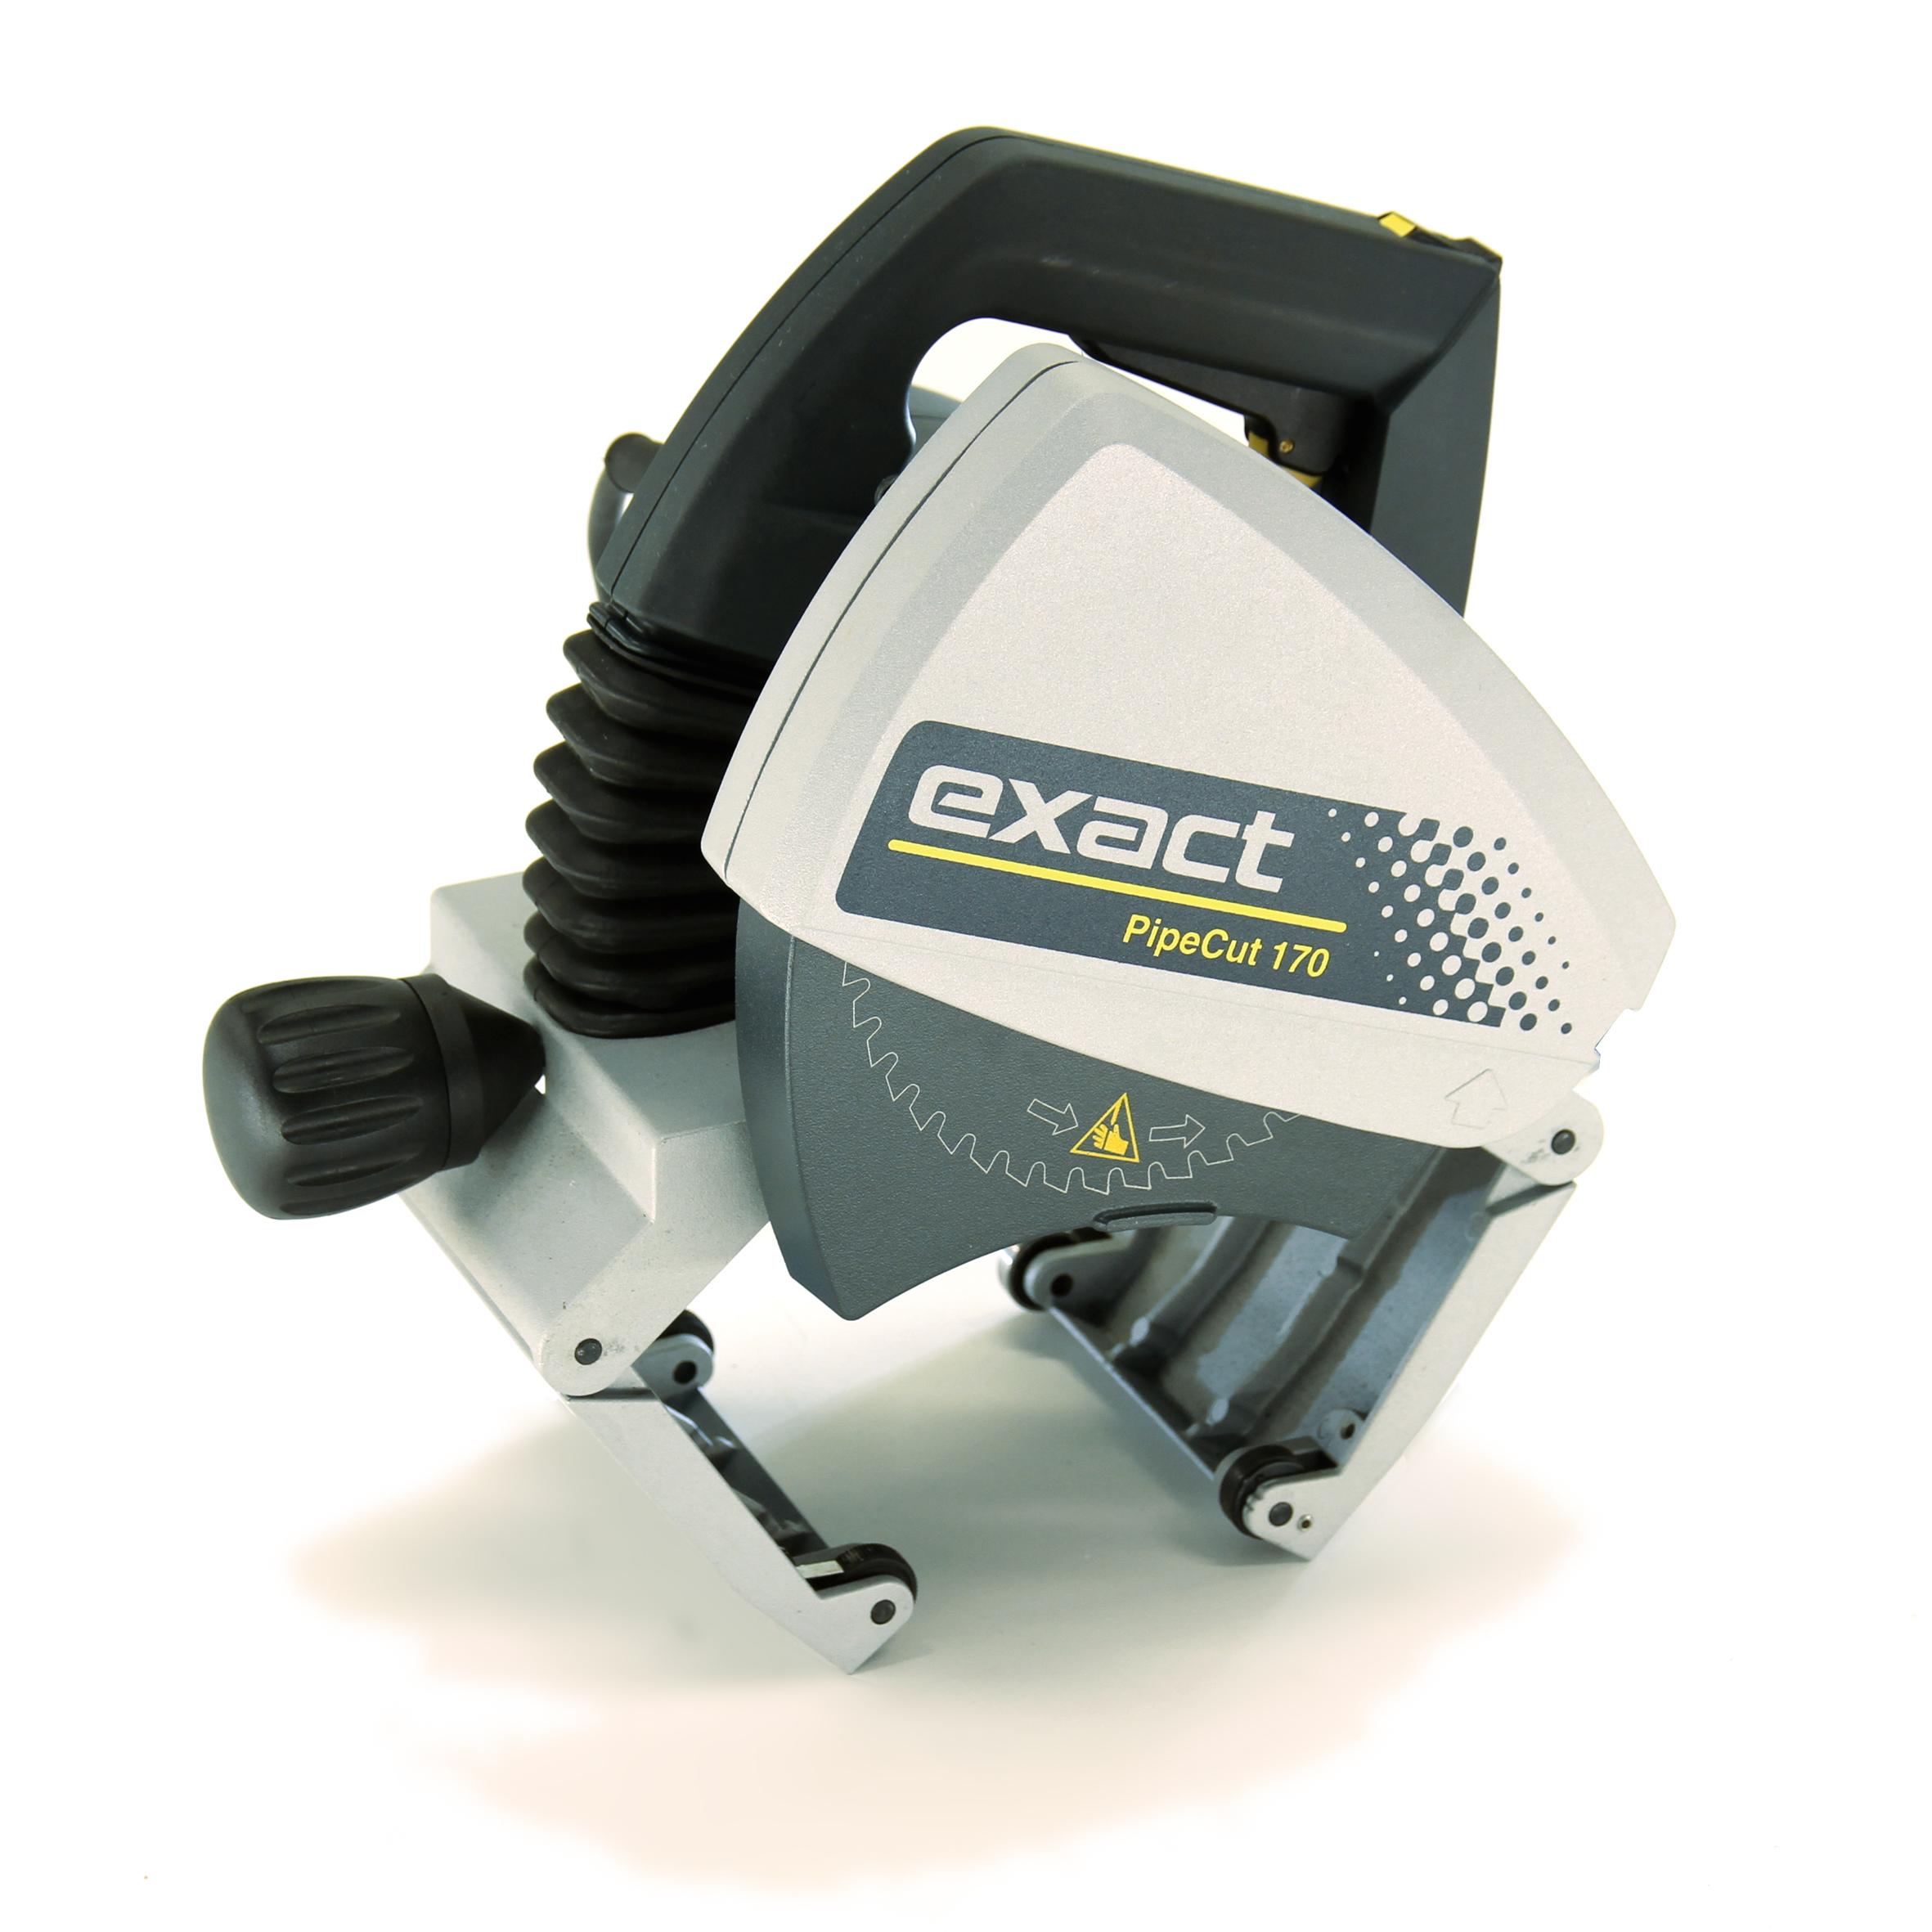 EXACT 170E Pipe Cutter